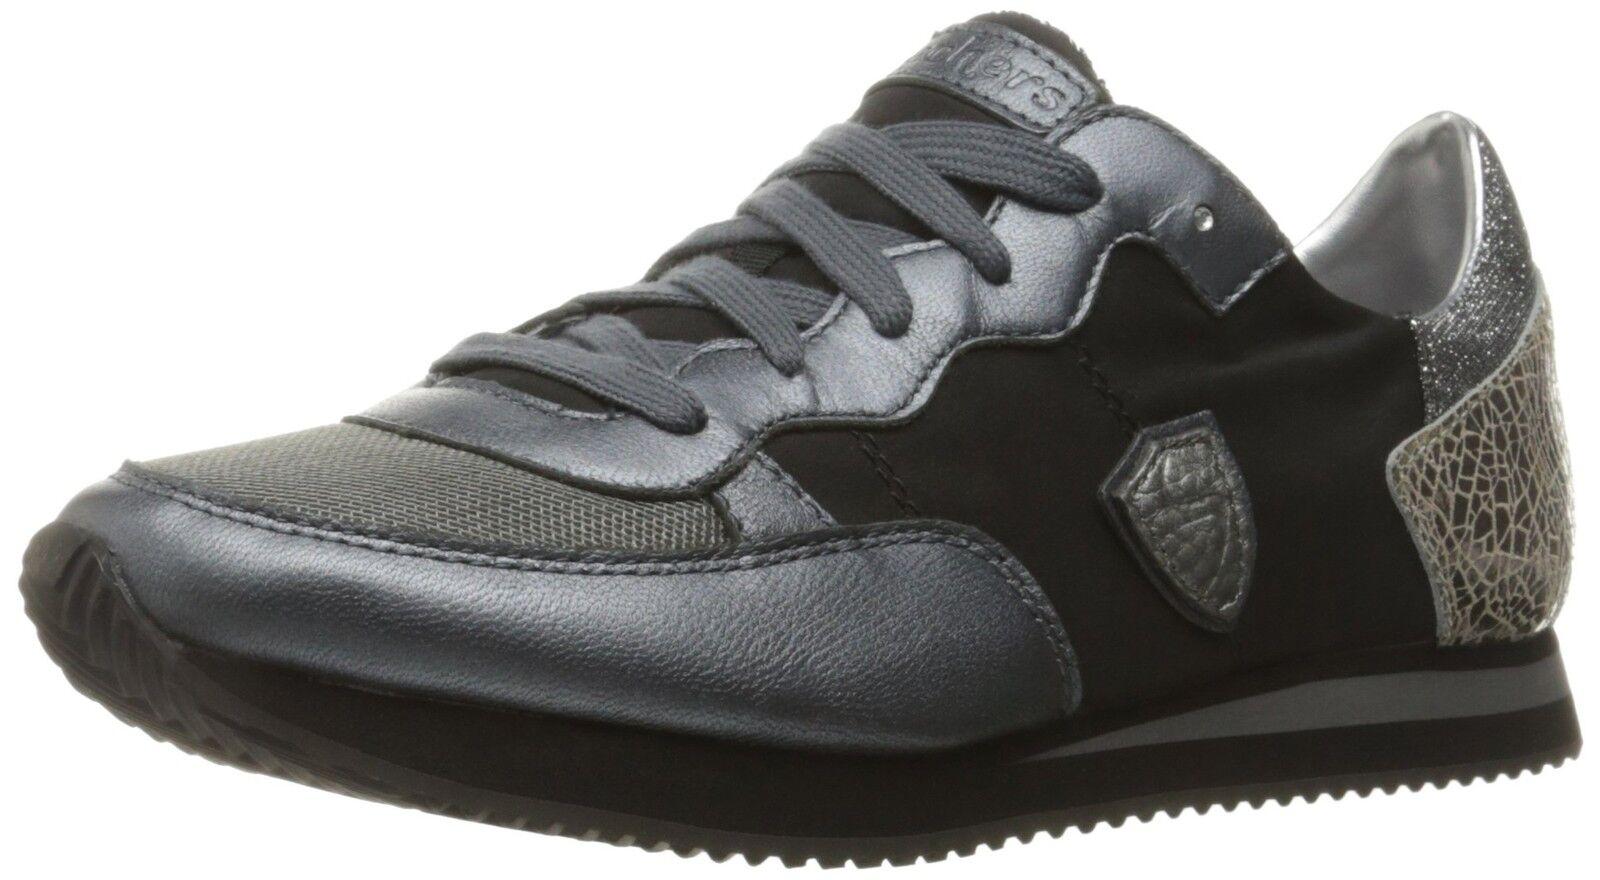 Skechers Originals Women's Retros OG 98 Classy Kicks Fashion Sneaker